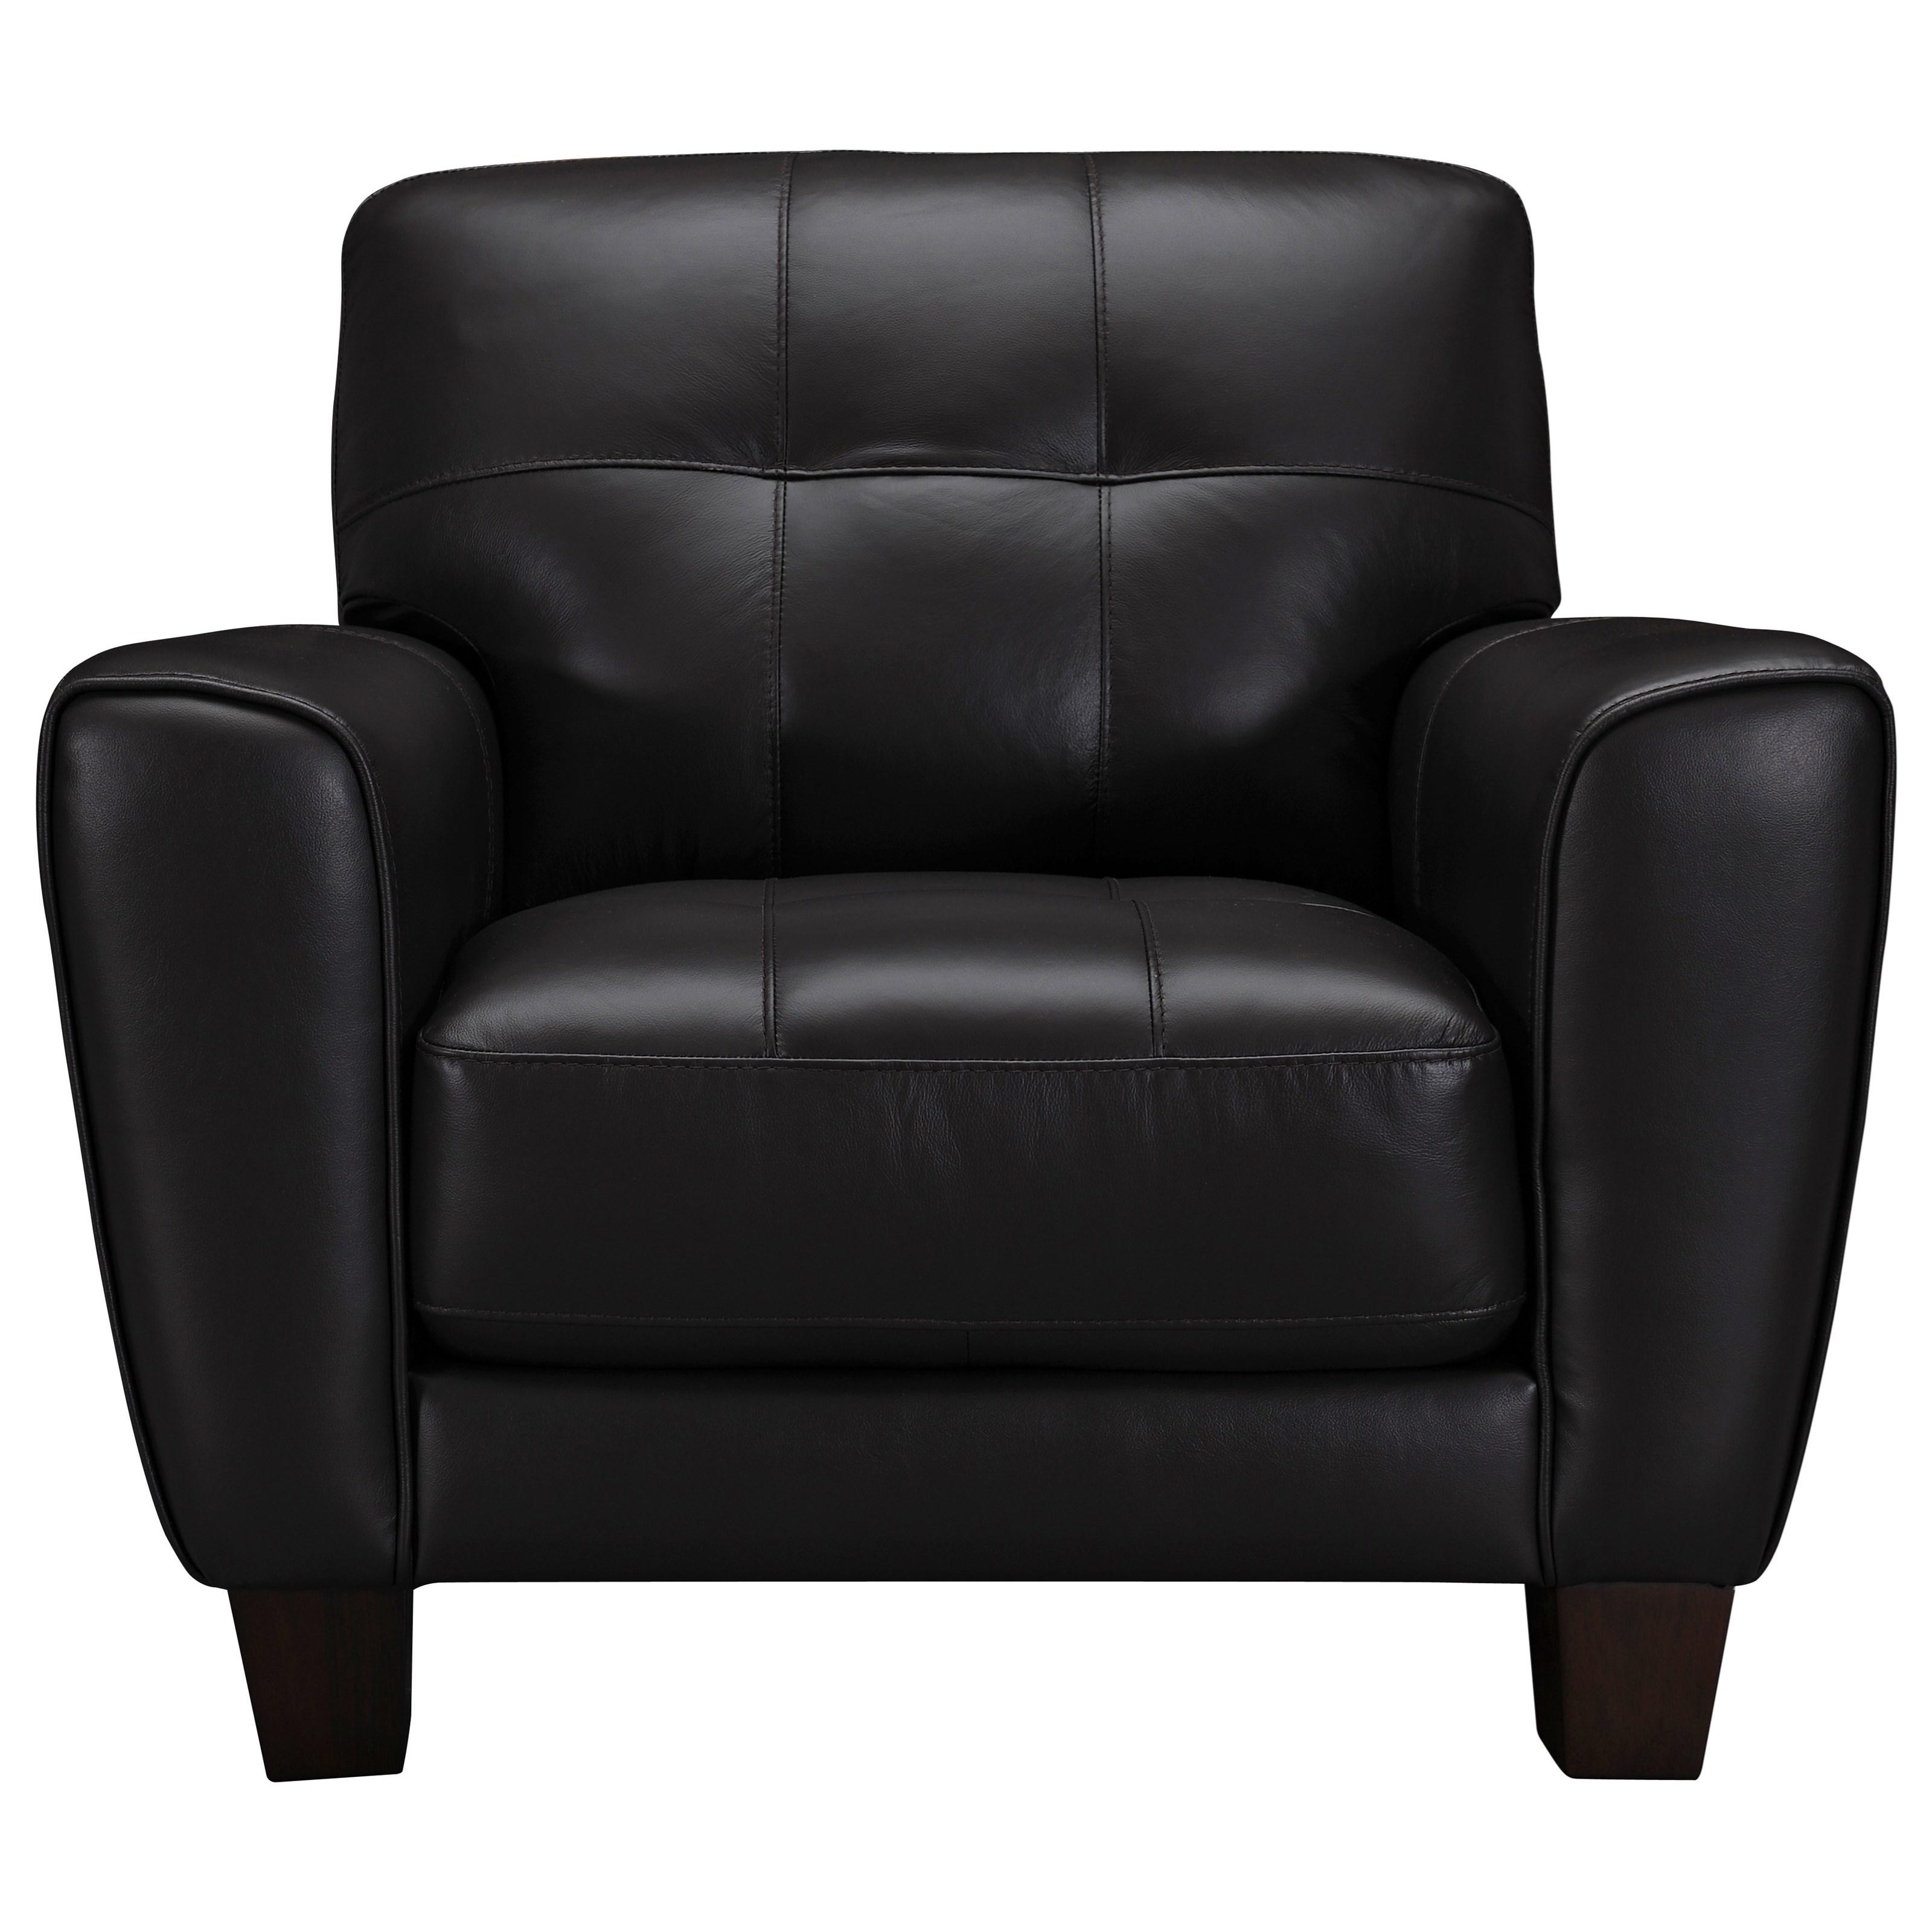 Becker 1950 31376 Chair - Item Number: 31376-1P-M-BND3030